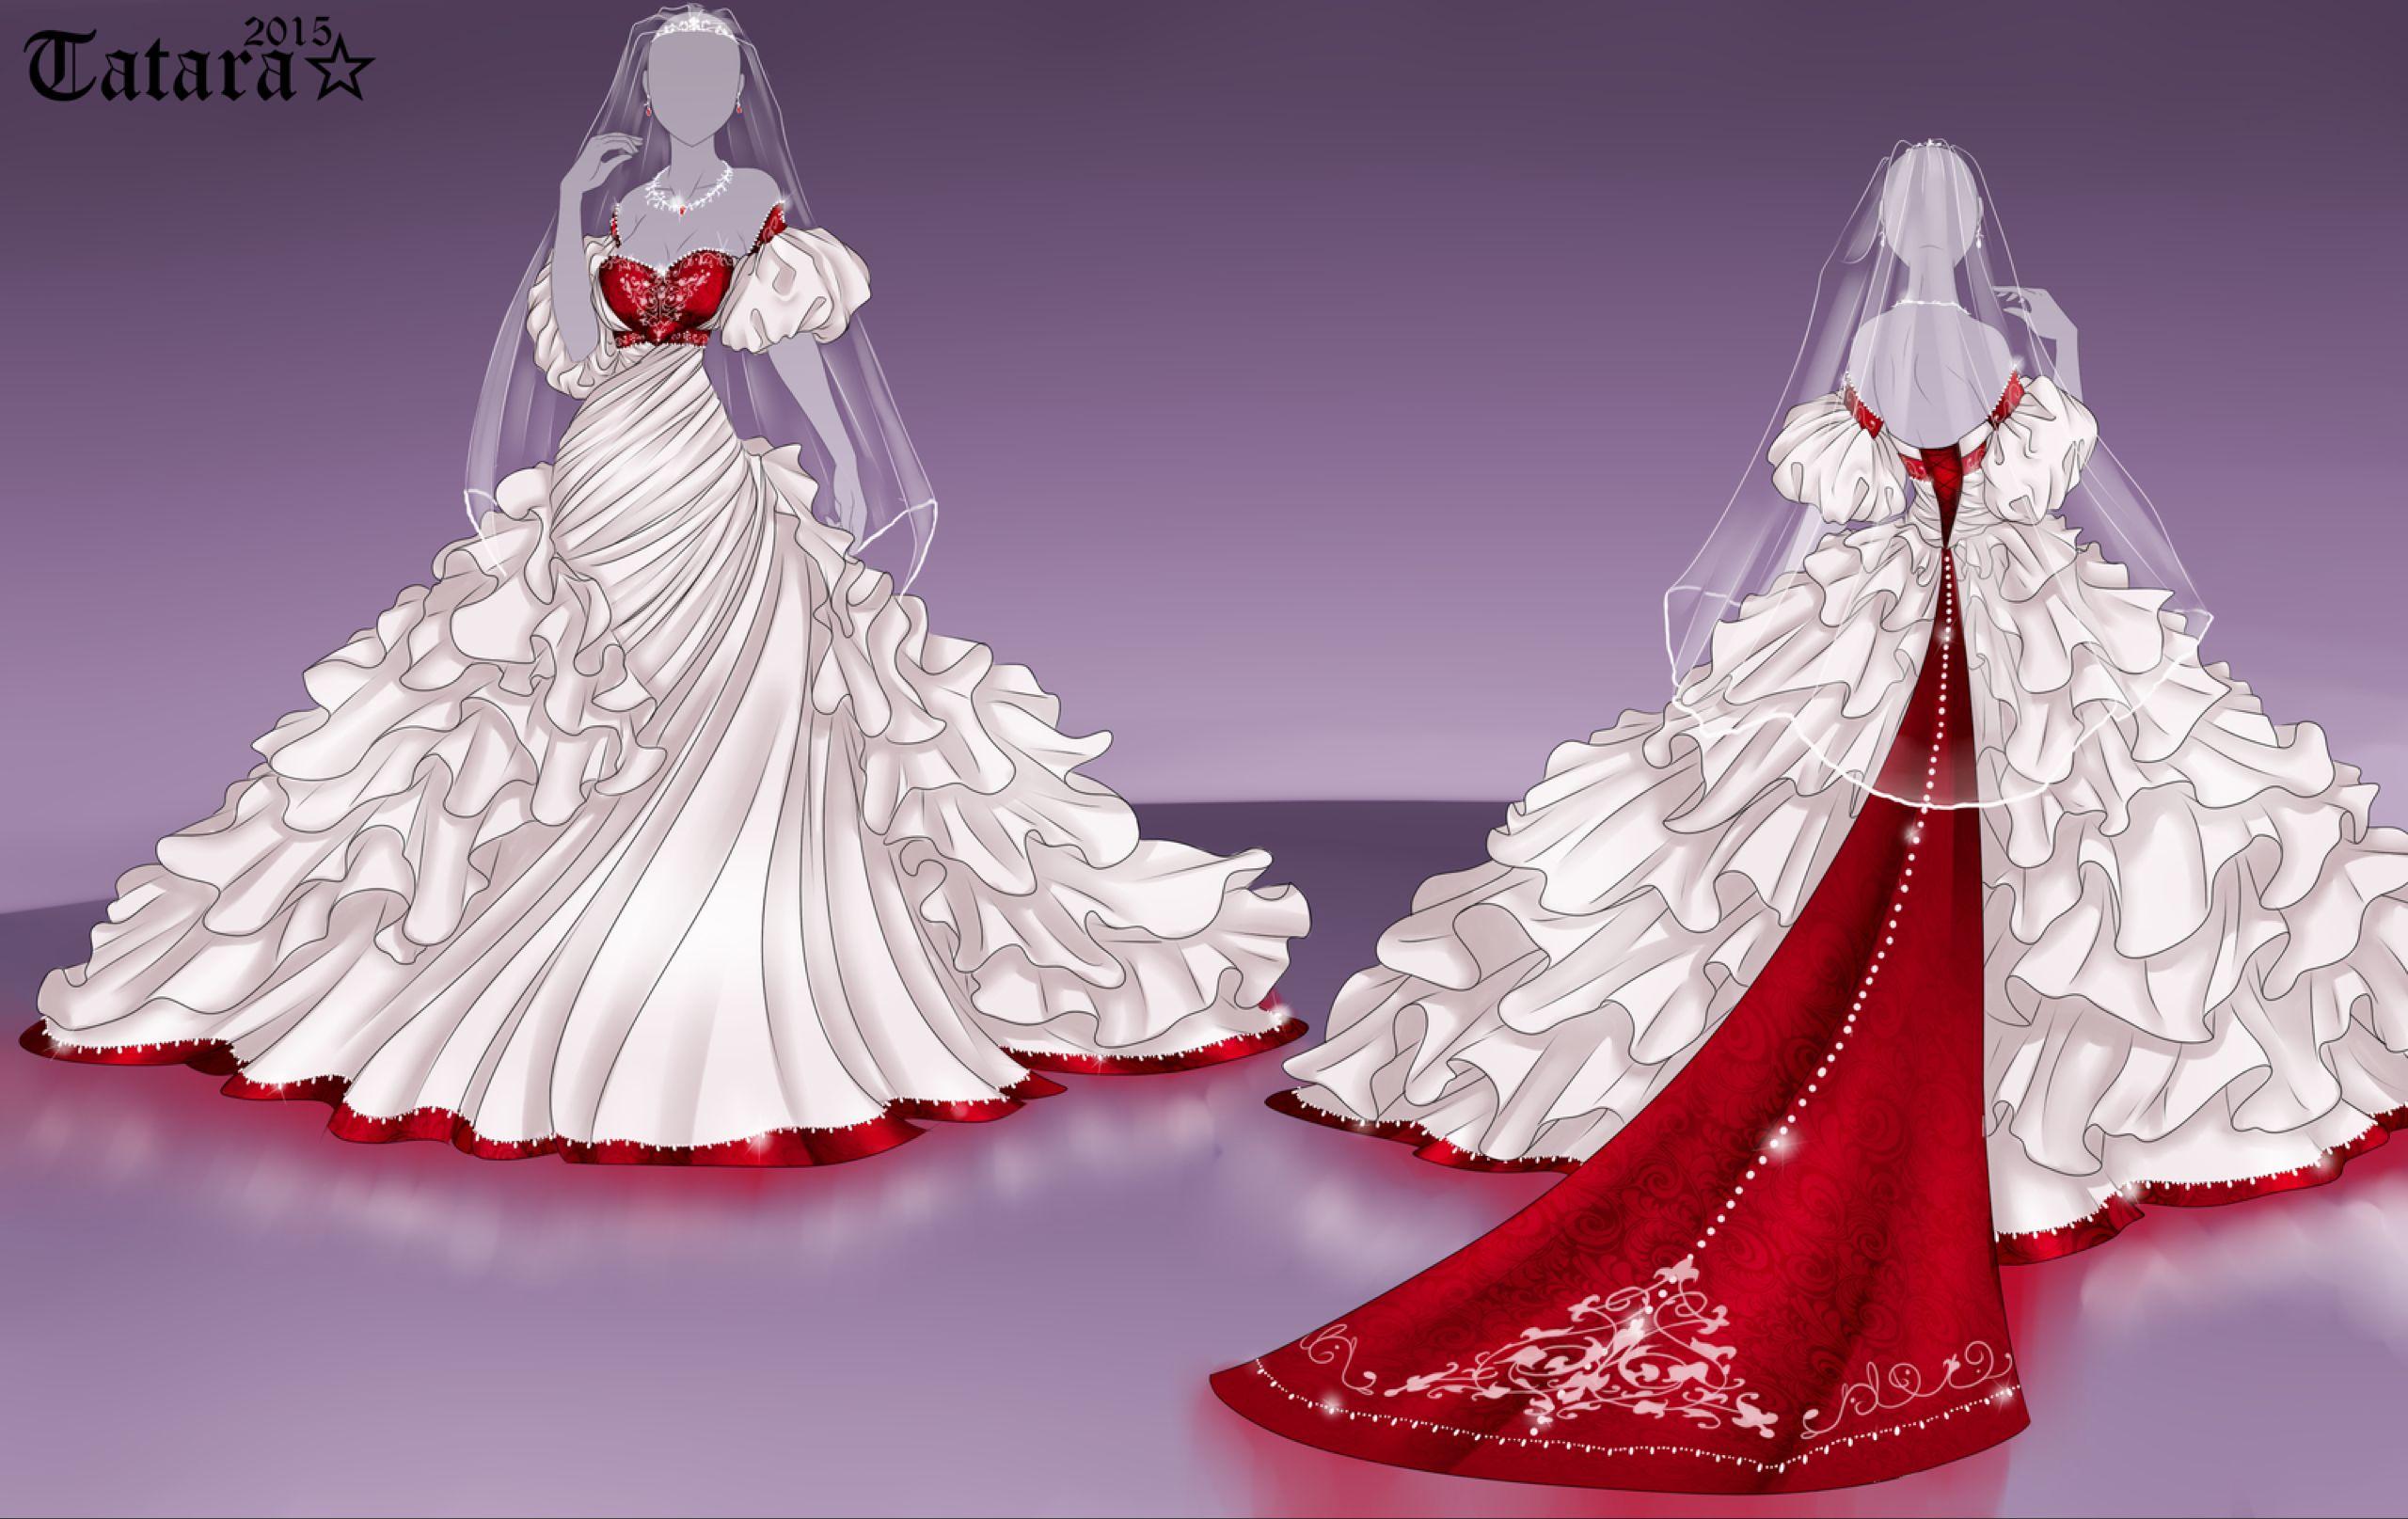 Dream Wedding Dress Design 1 By Tatara94 On Deviantart Wedding Dress Drawings Anime Dress Fashion Design Drawings